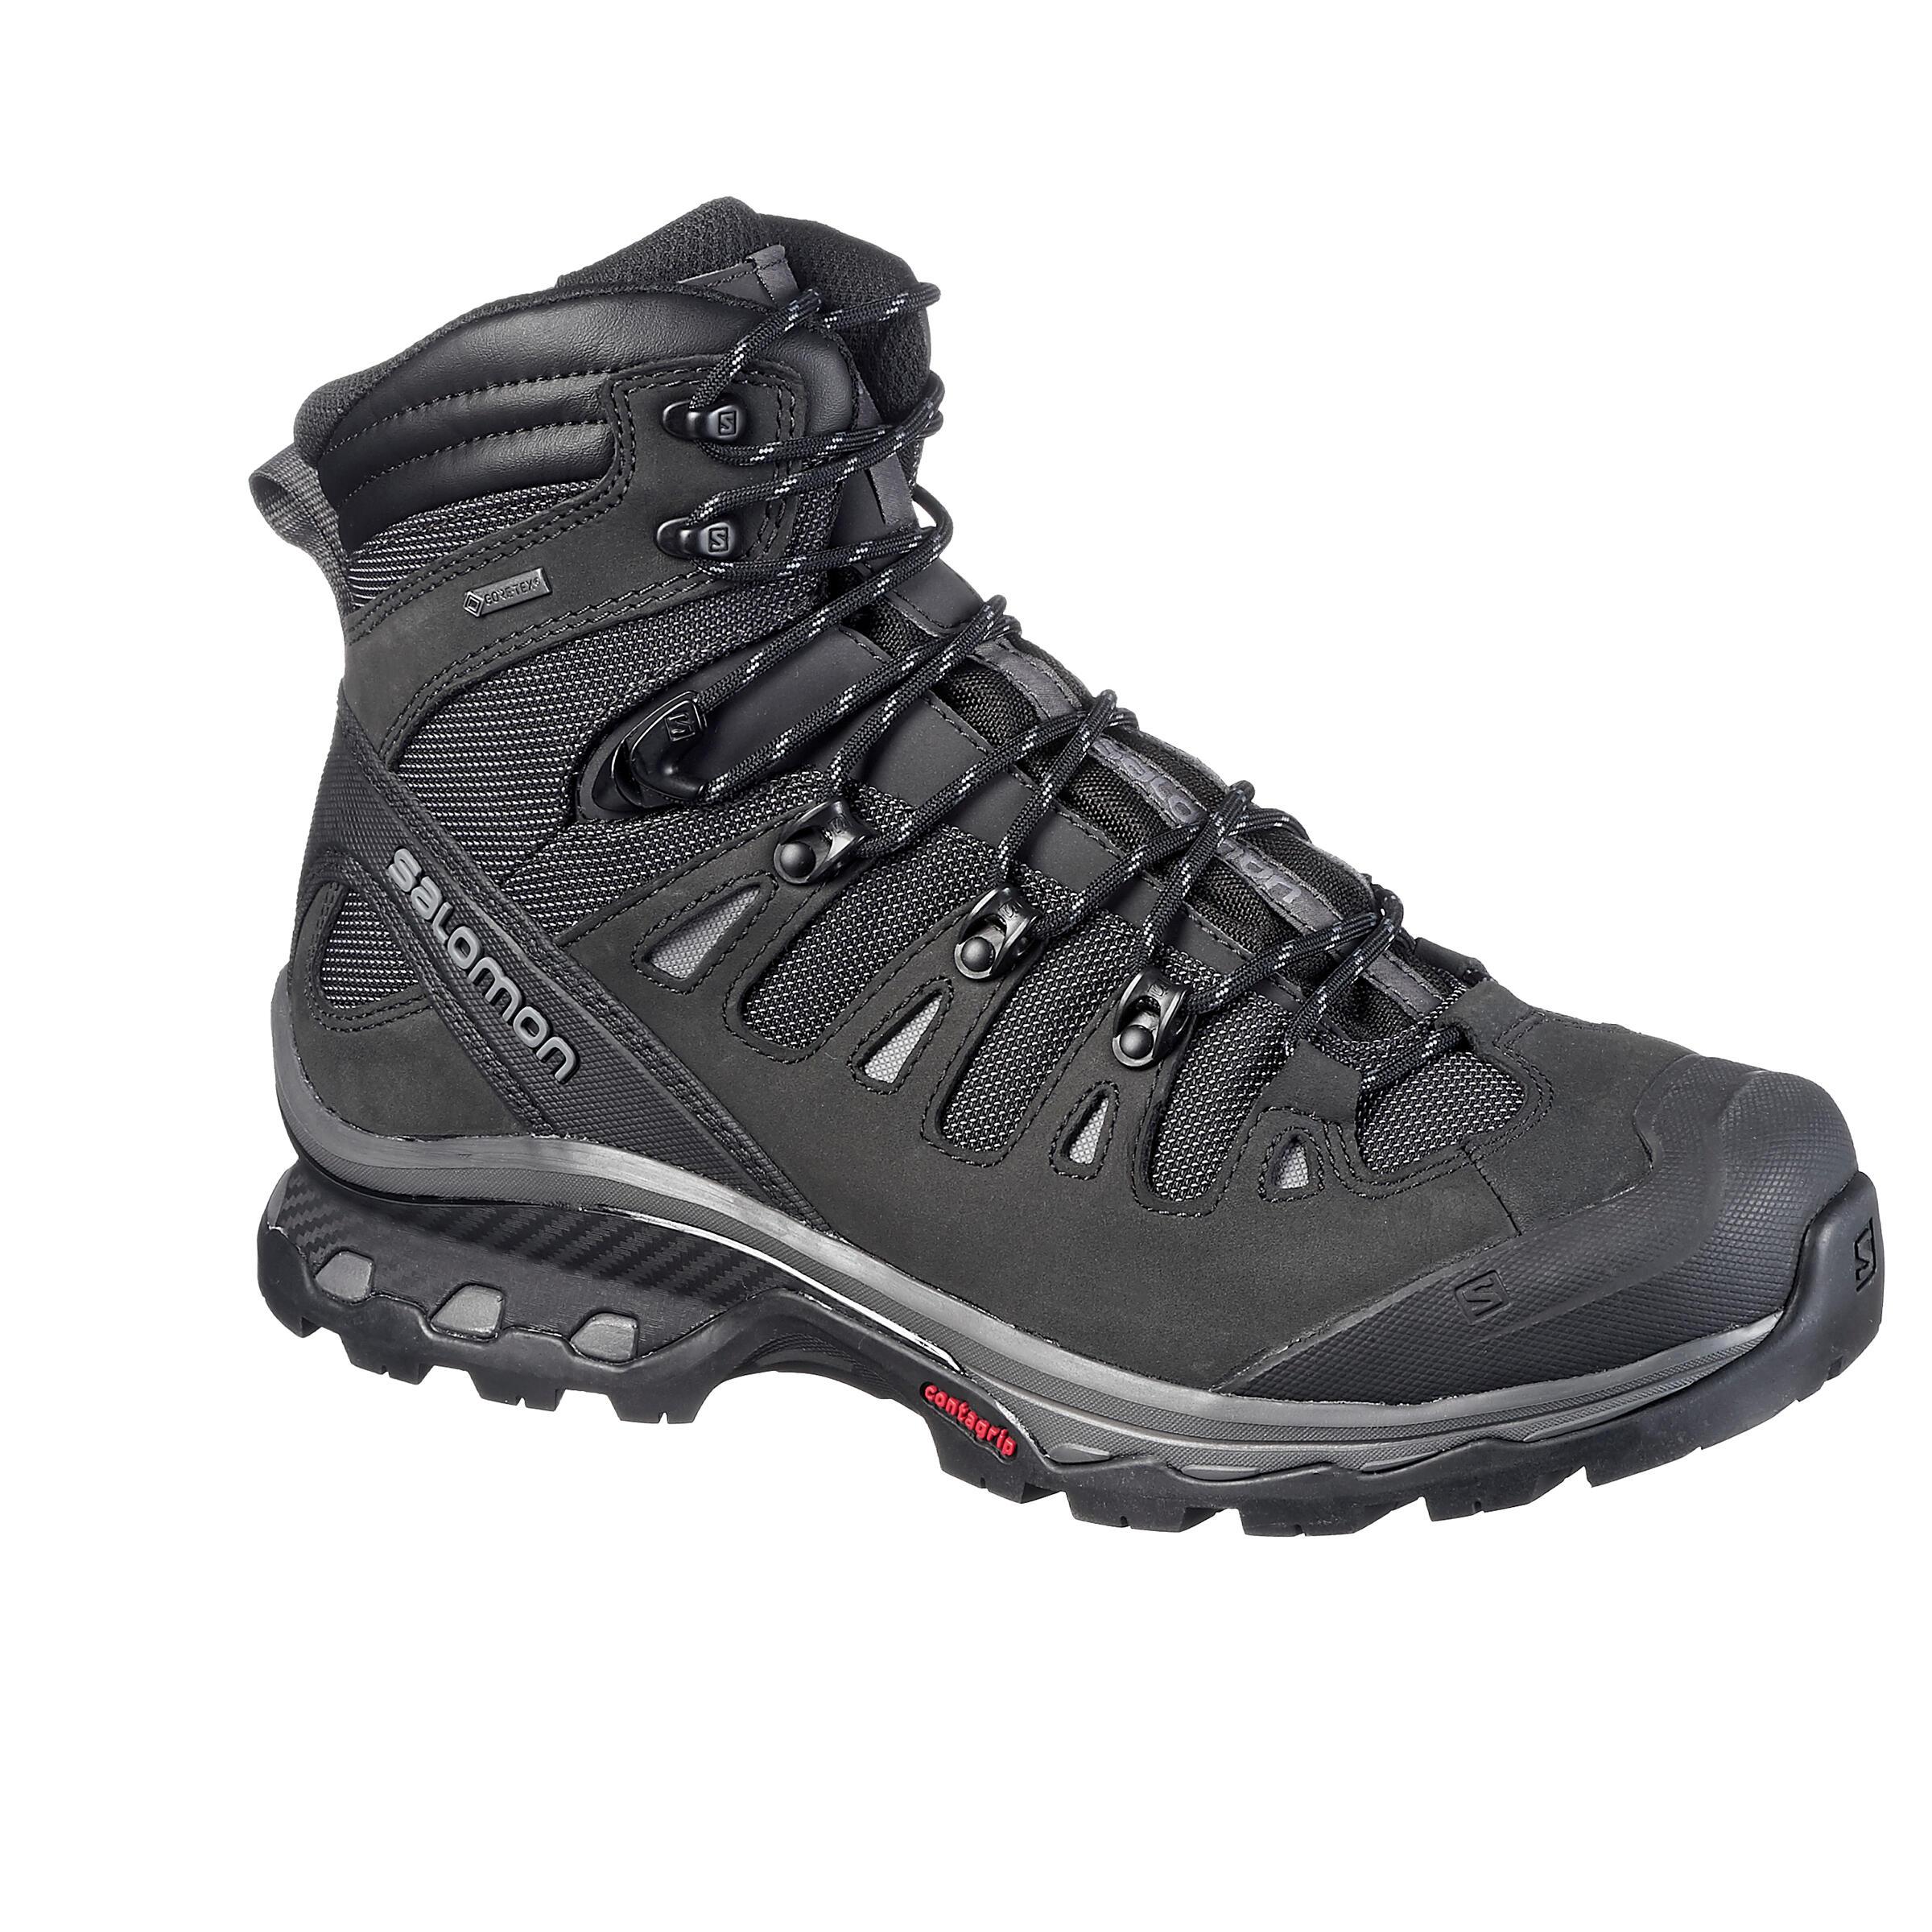 Trekking Chaussures Trekking Bottes des Rangers Outdoor Hommes Sport Chaussures Talons